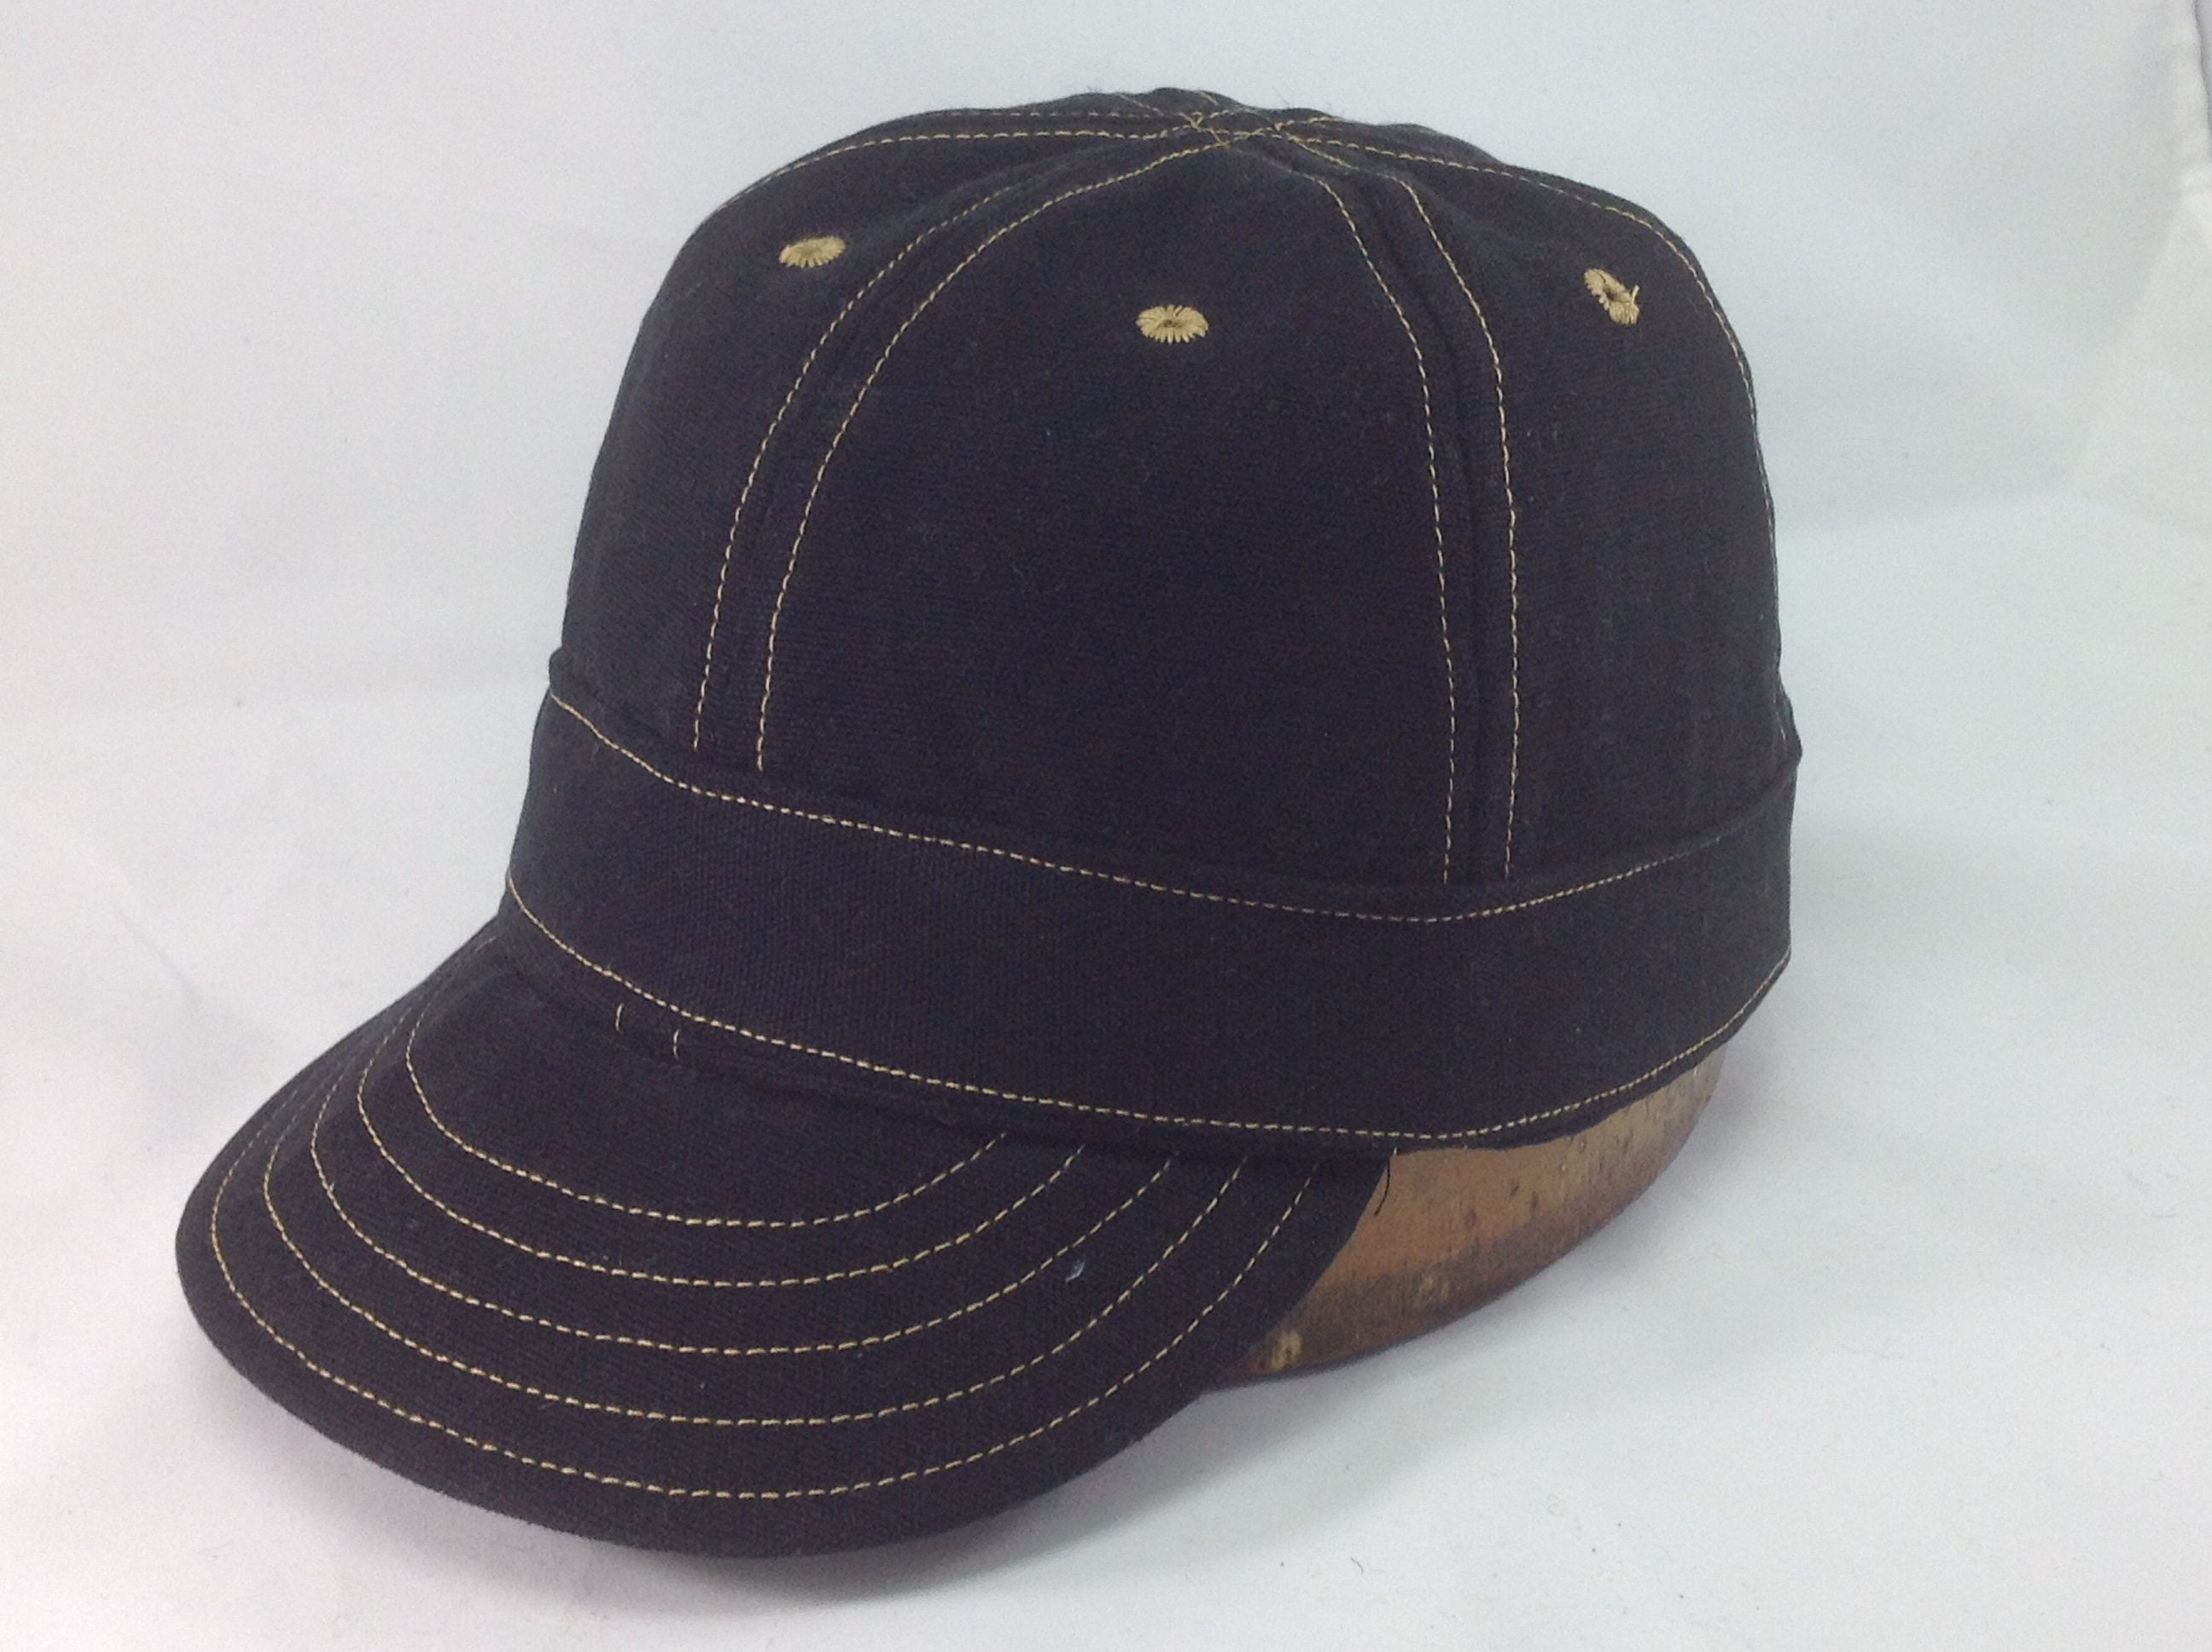 Mechanics cap - custom made to order, six panel cap with